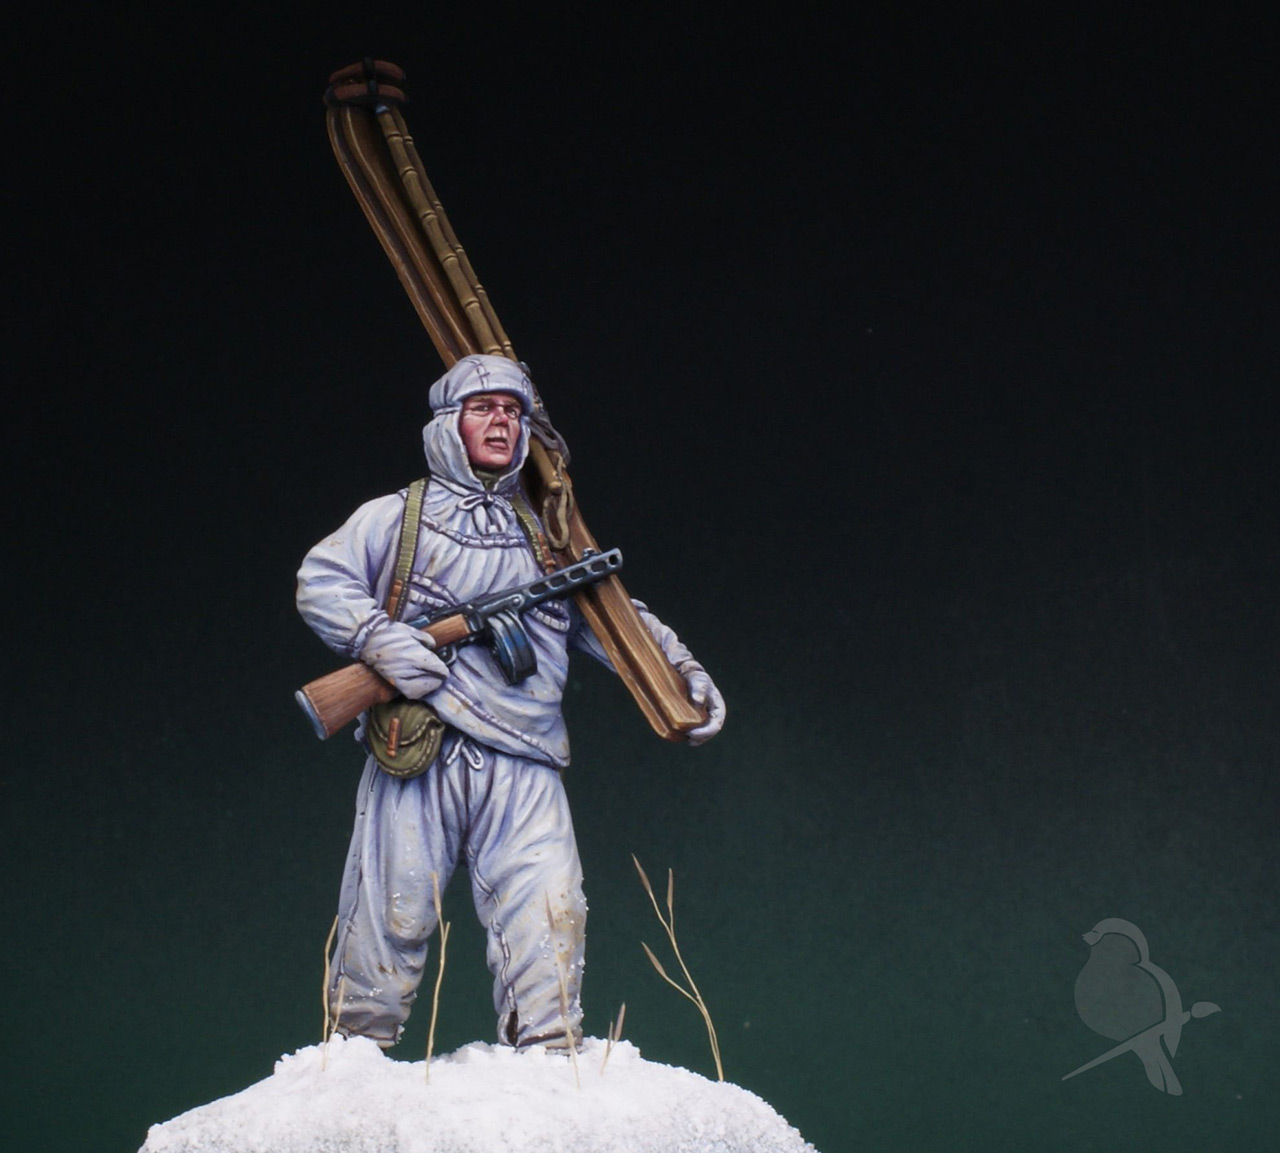 Figures: Soviet ski trooper, photo #1